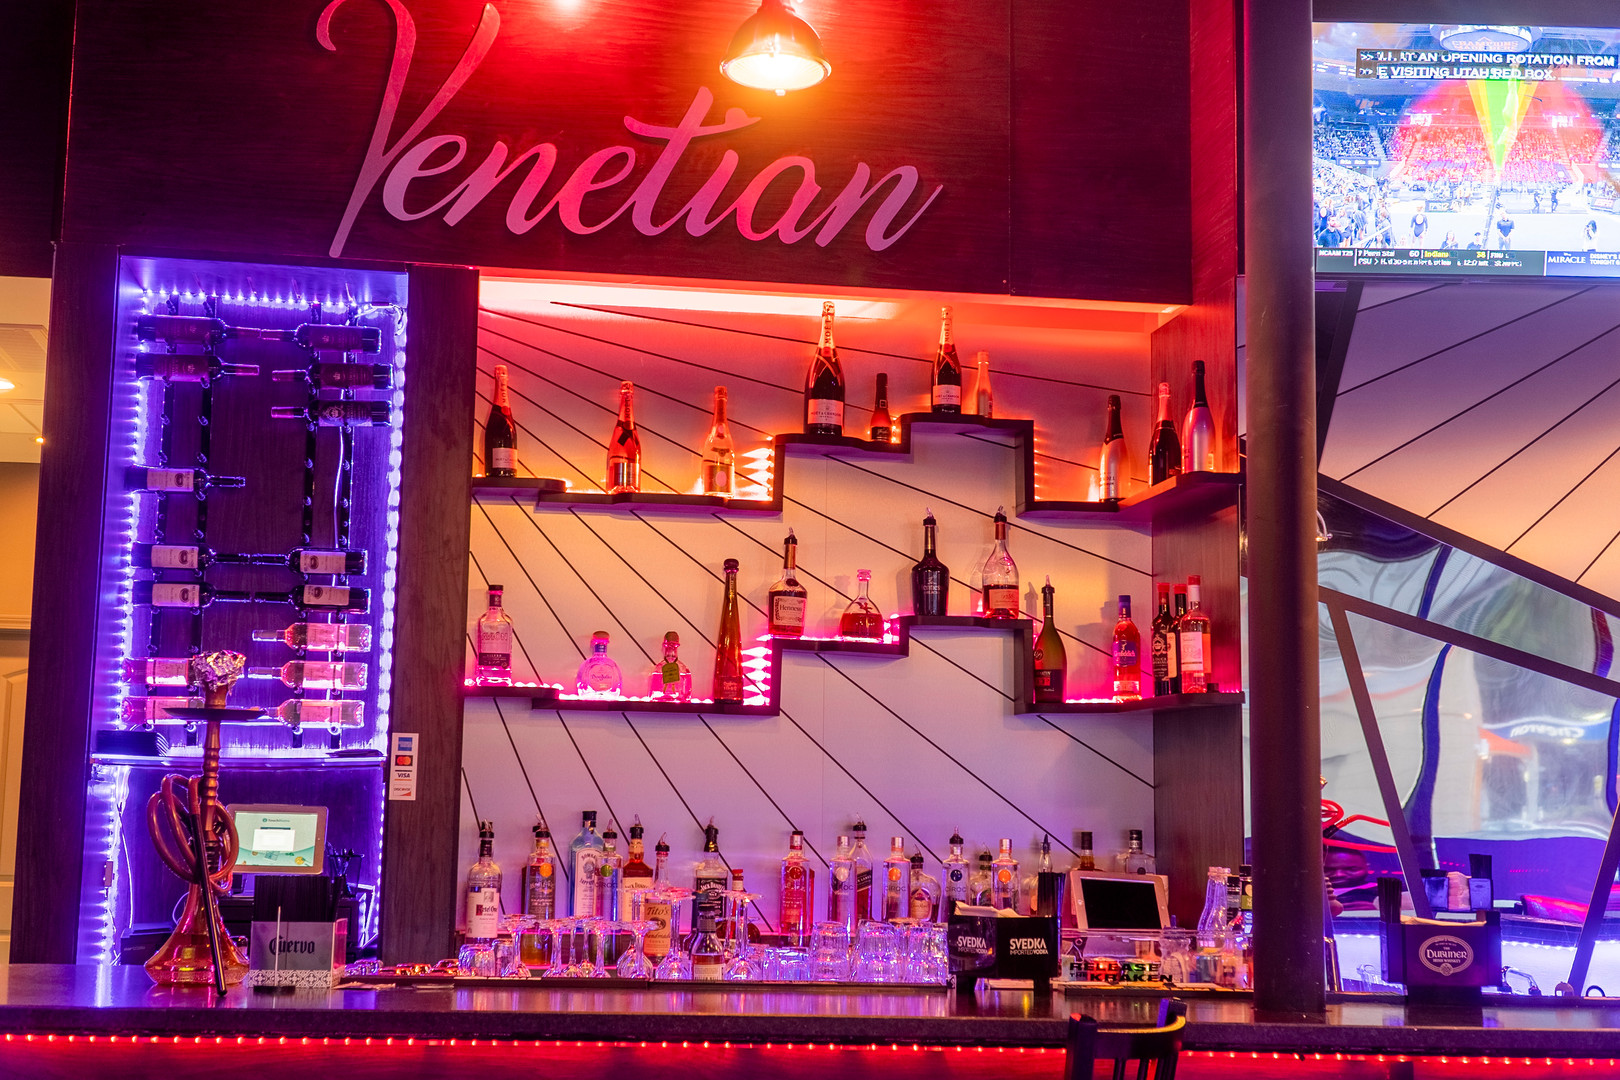 Venetian Cafe and Bar 47.jpg